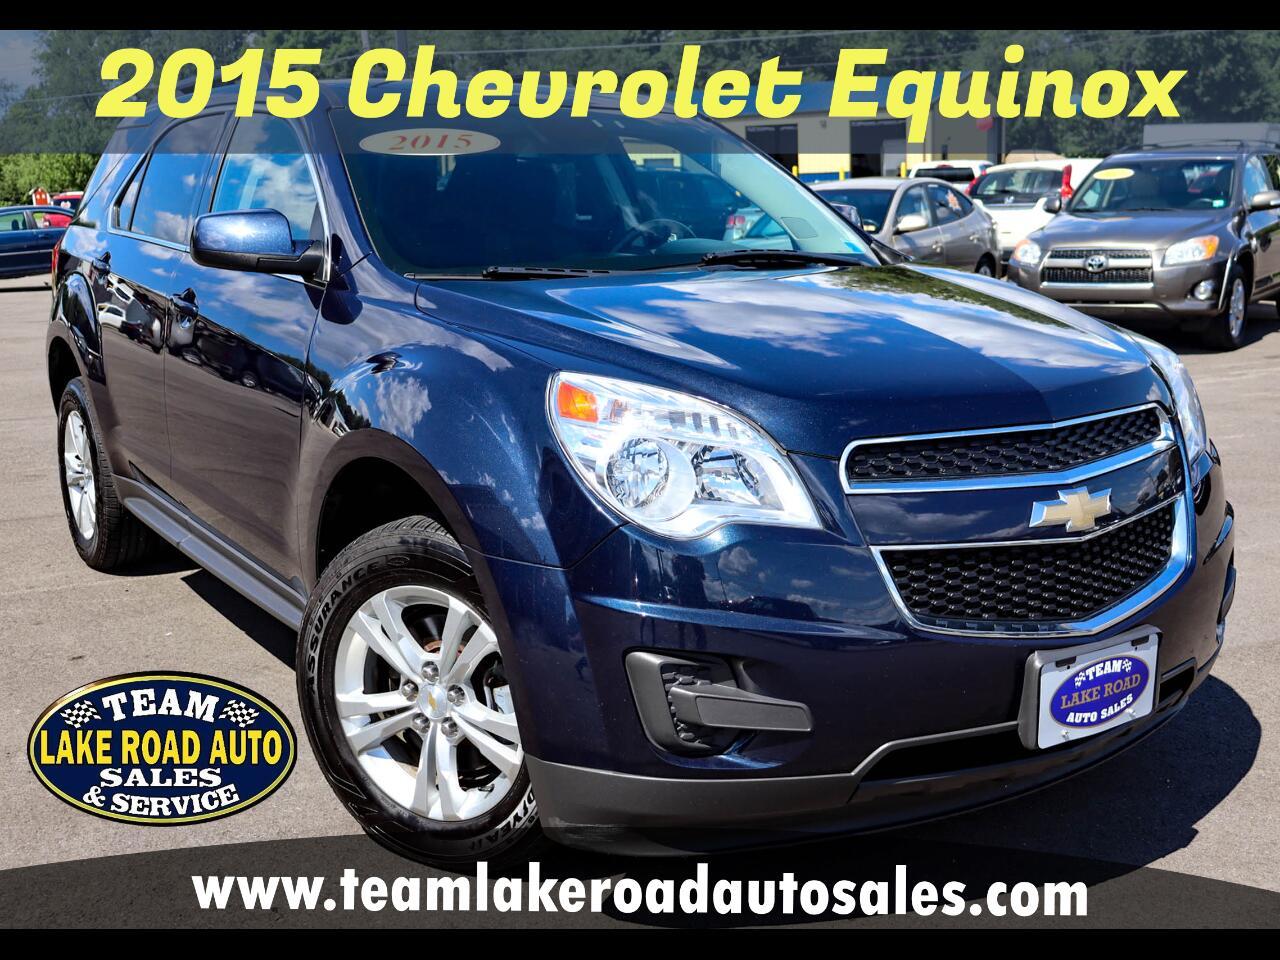 Chevrolet Equinox AWD 4dr LT w/1LT 2015